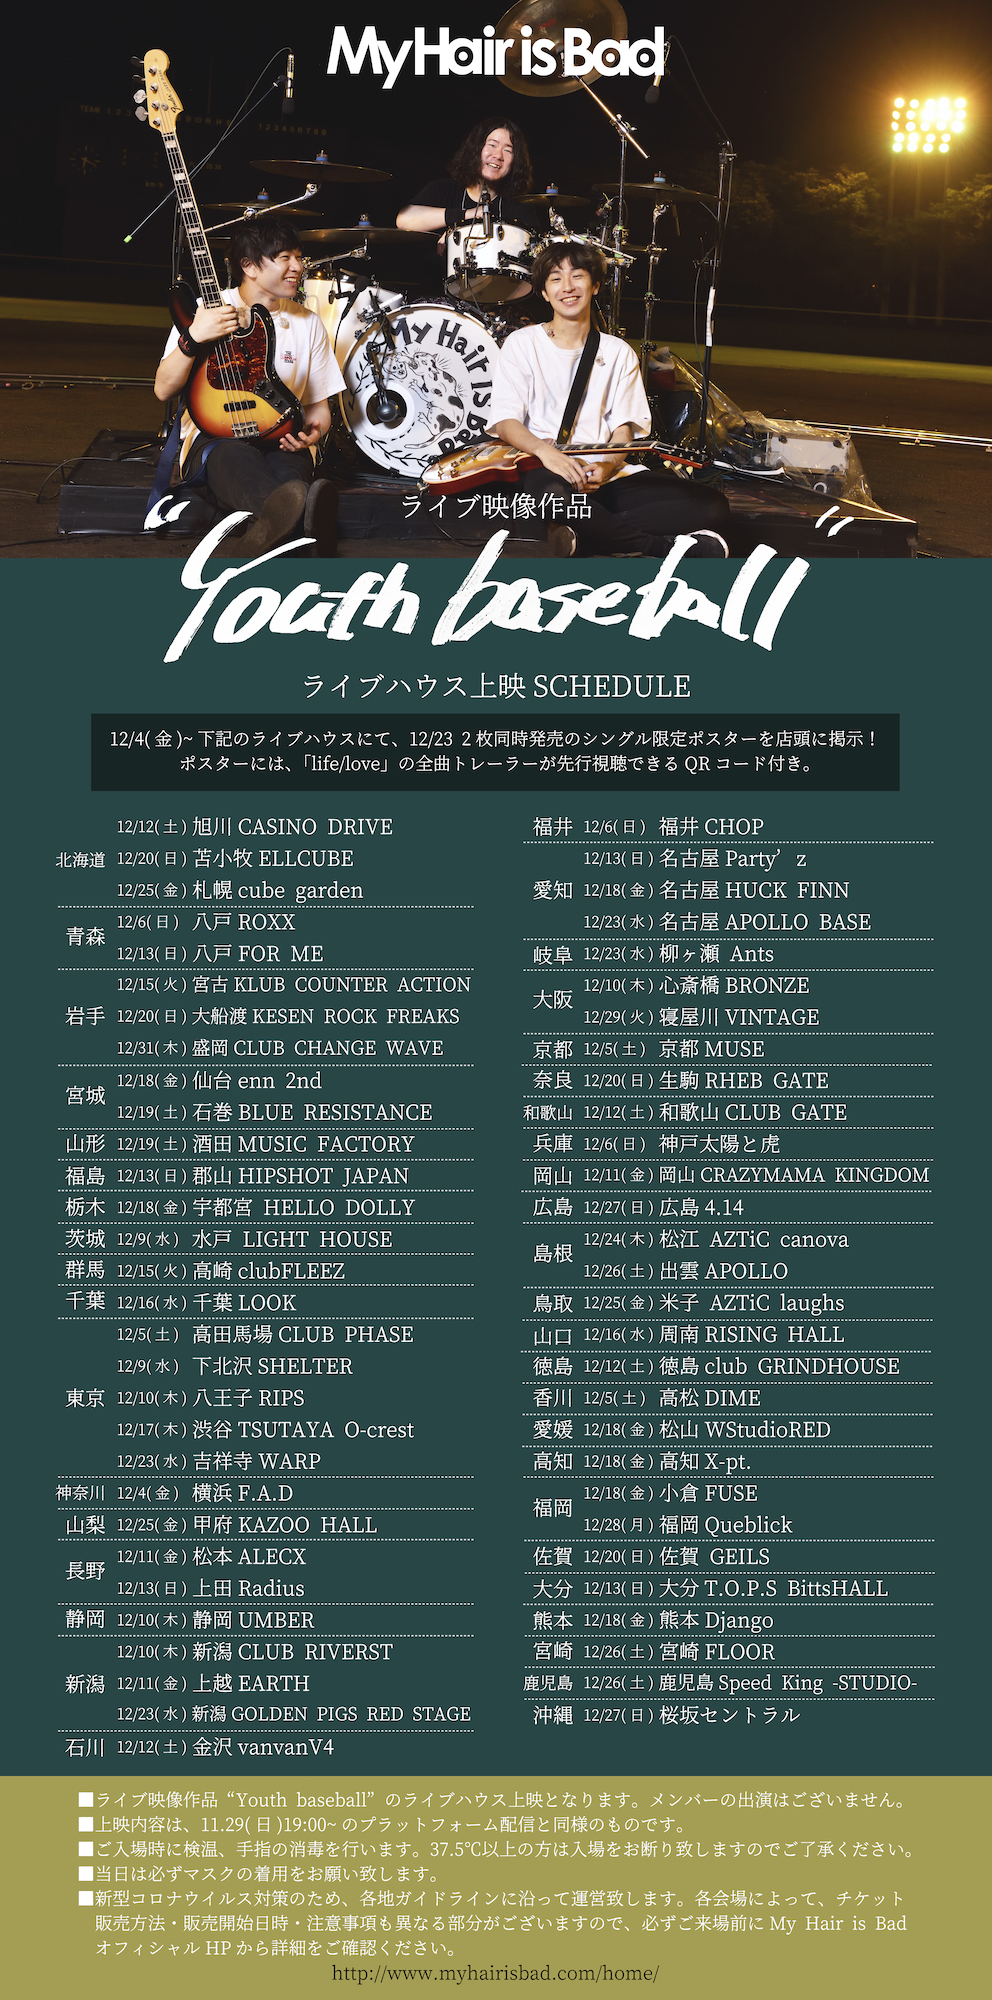 "My Hair is Bad ライブ映像作品 ""Youth baseball"" 上映イベント"